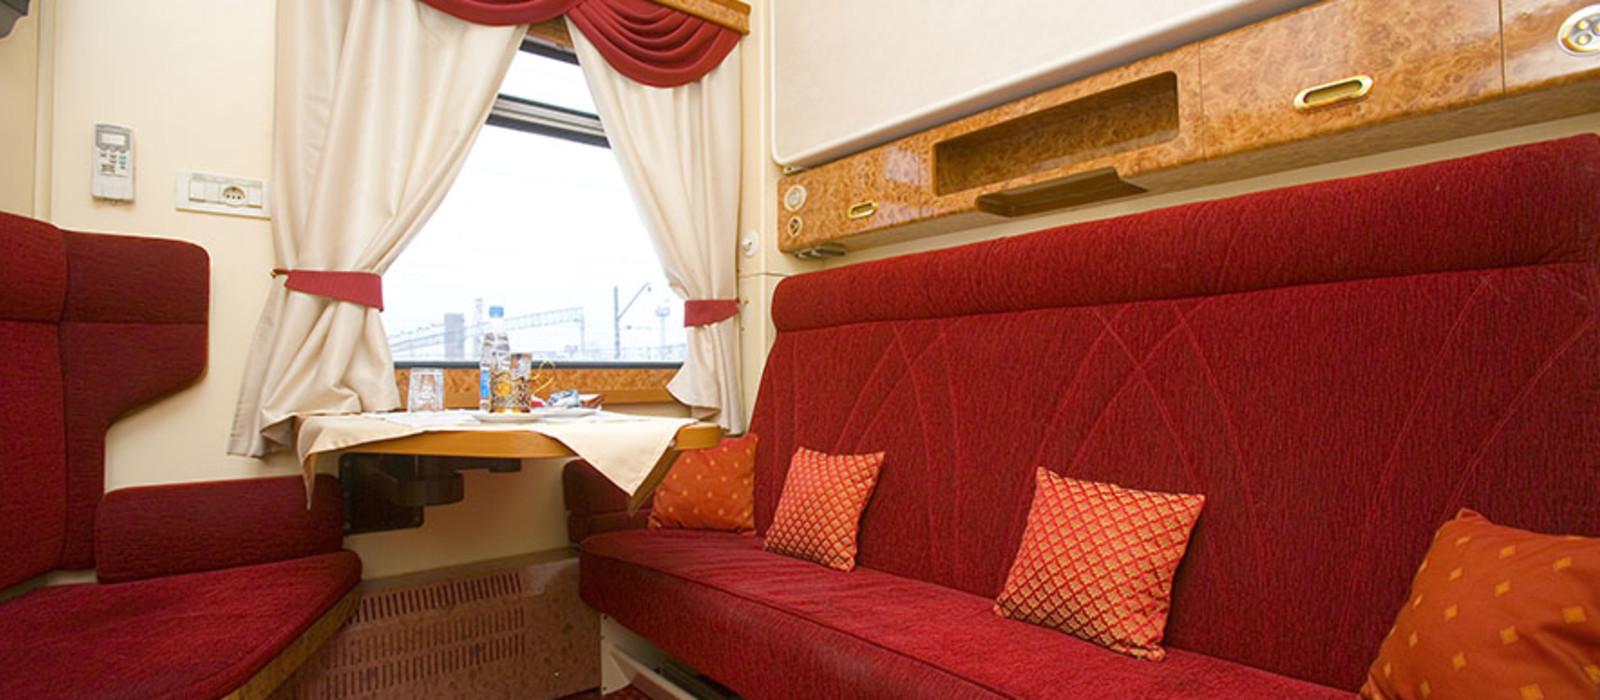 Hotel Imperial Russia Train %region%